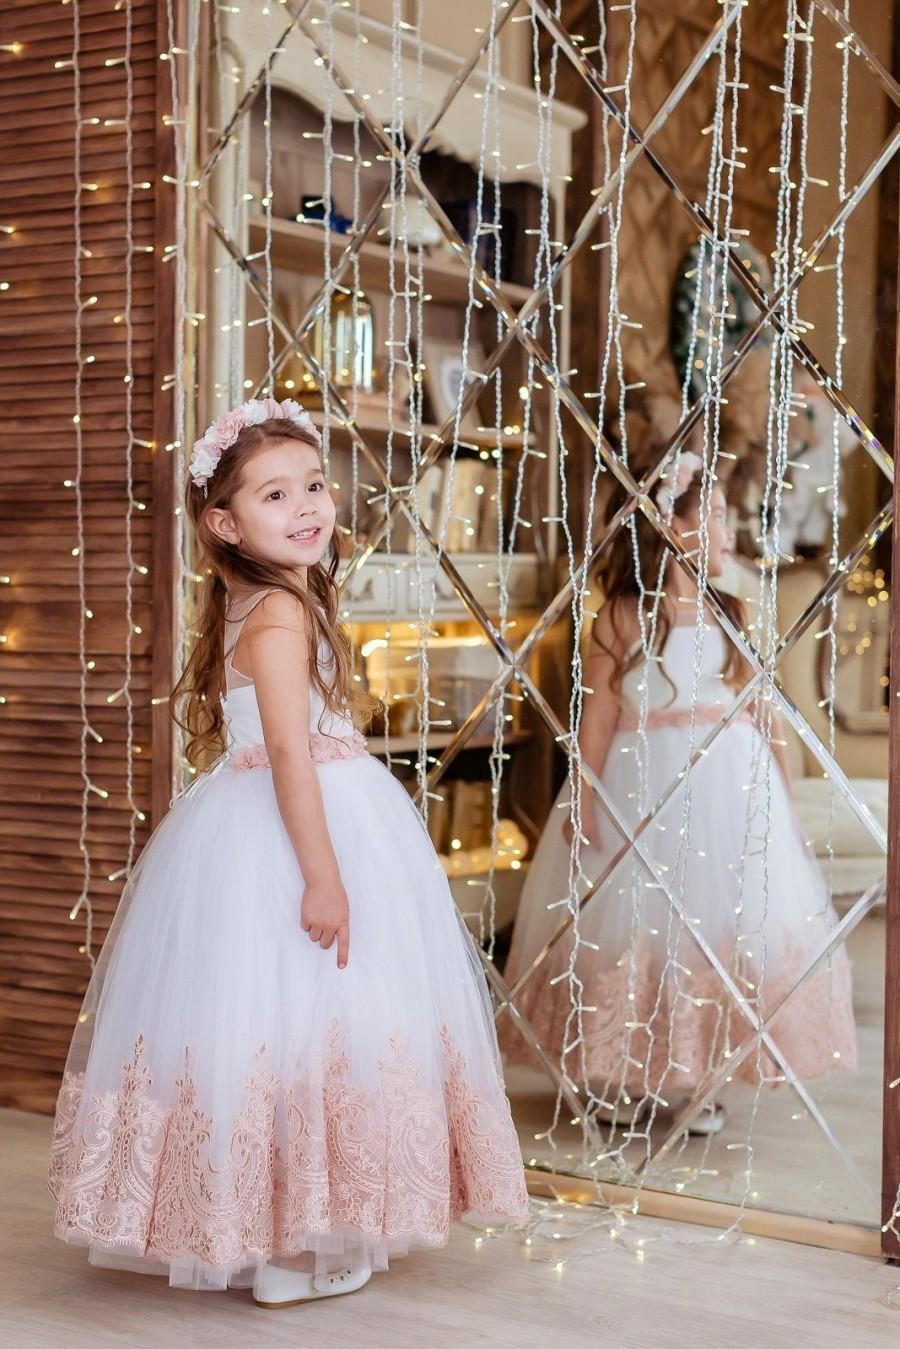 Mariage - Flower Girl Dress, Wedding Girl Dress, White Flower Hirl Dress, Junior Bridesmaid Dress, Flower Girl Dresses, Lace Flowers Girl Dress, Dress